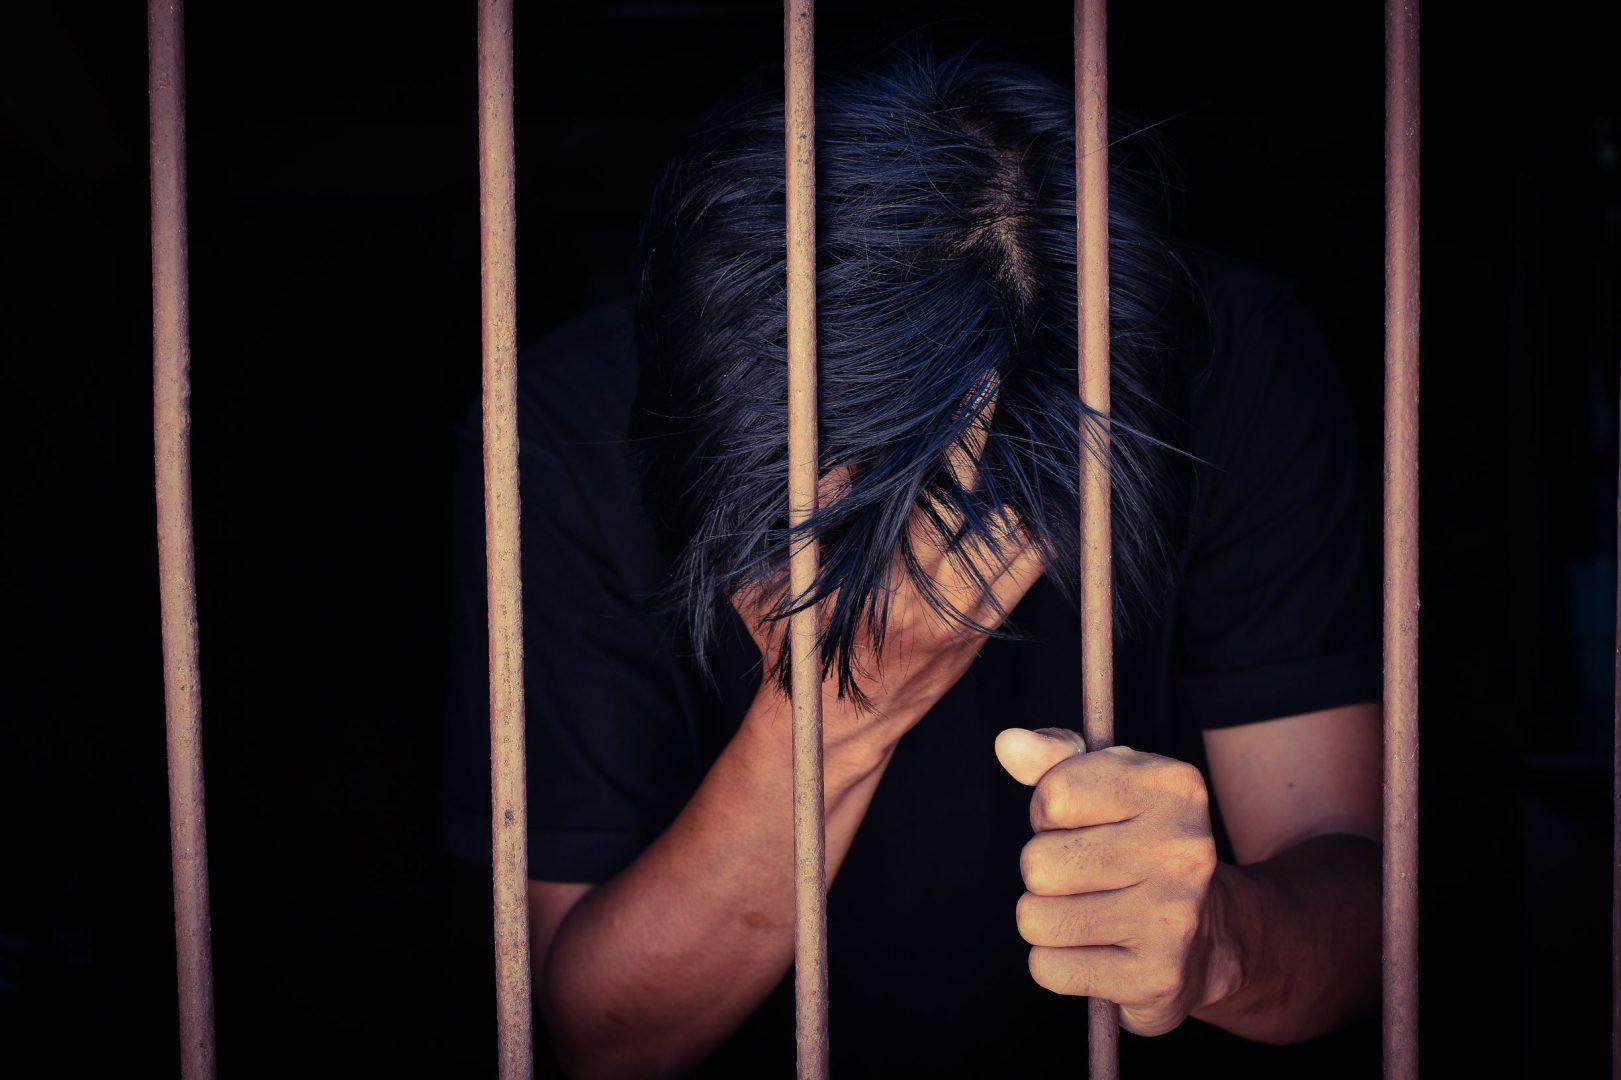 Stuck in Jail in Dallas